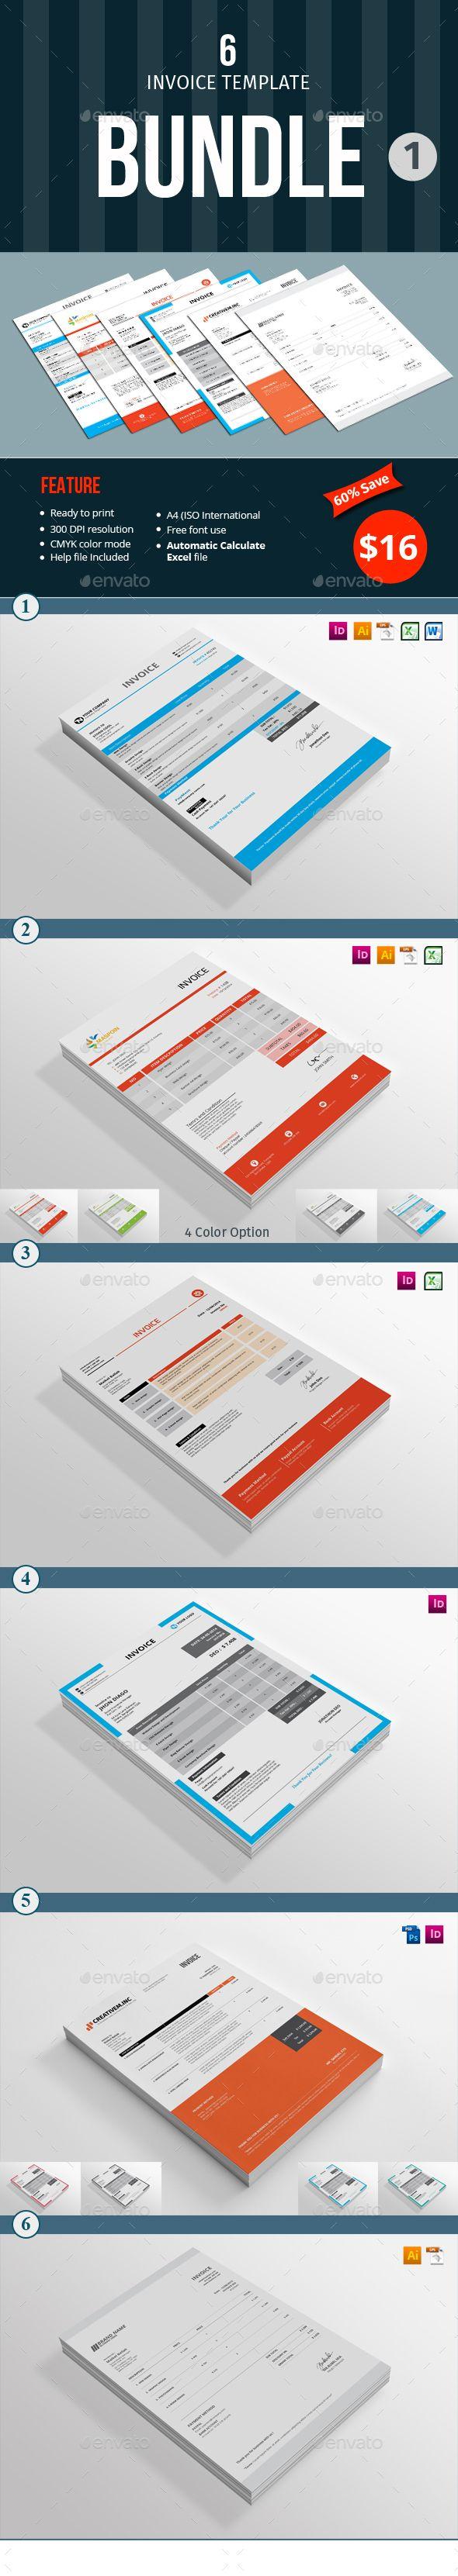 Invoice Template Bundle 1 Template Font Logo And Logos